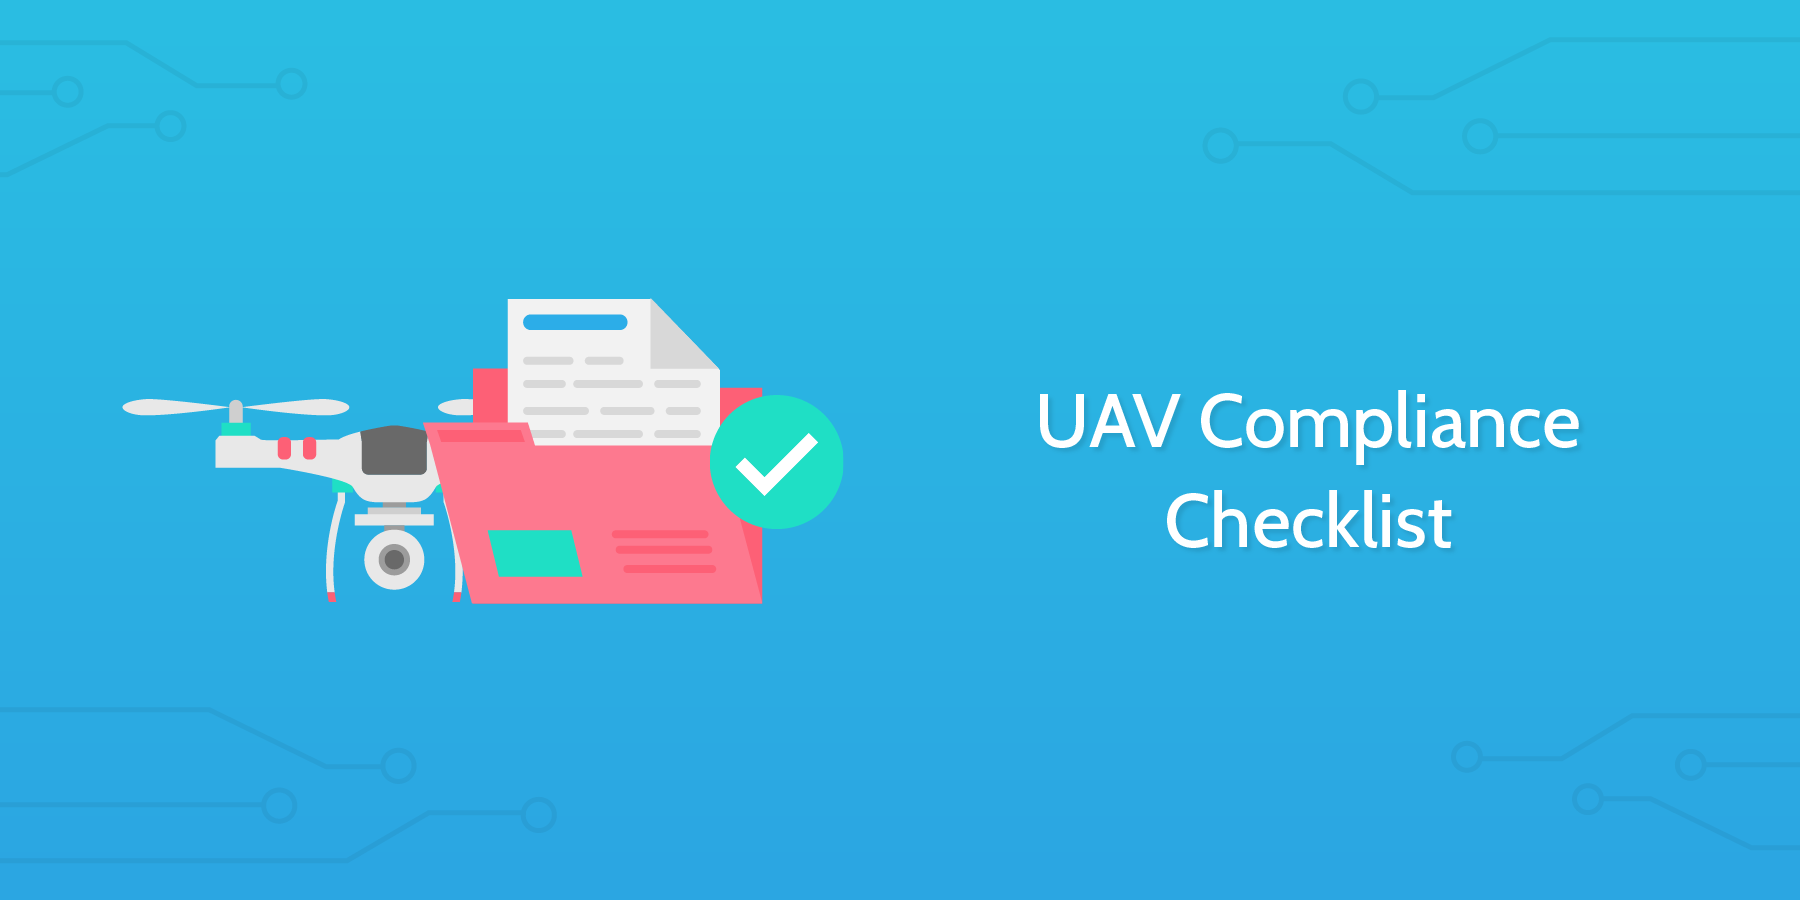 UAV Compliance Checklist